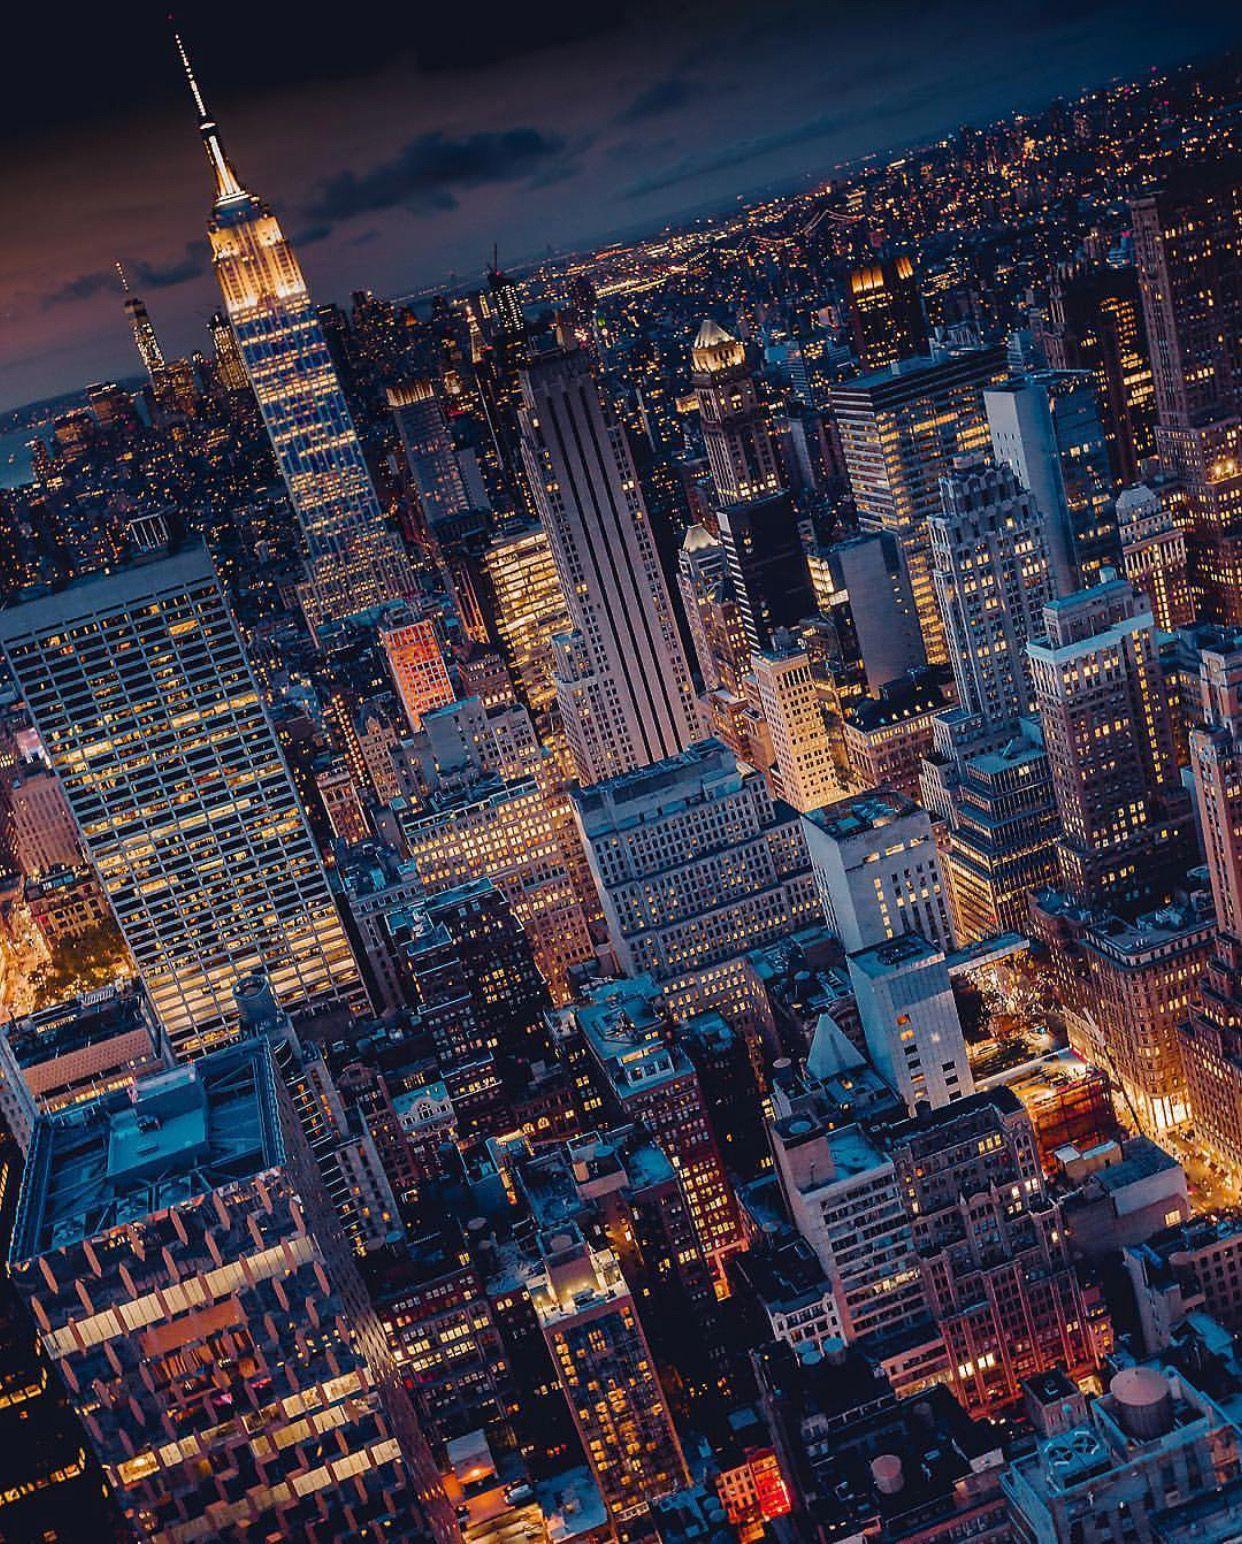 Pin By Carlos Rivera On Gotham City City Photography Urban Landscape City Aesthetic